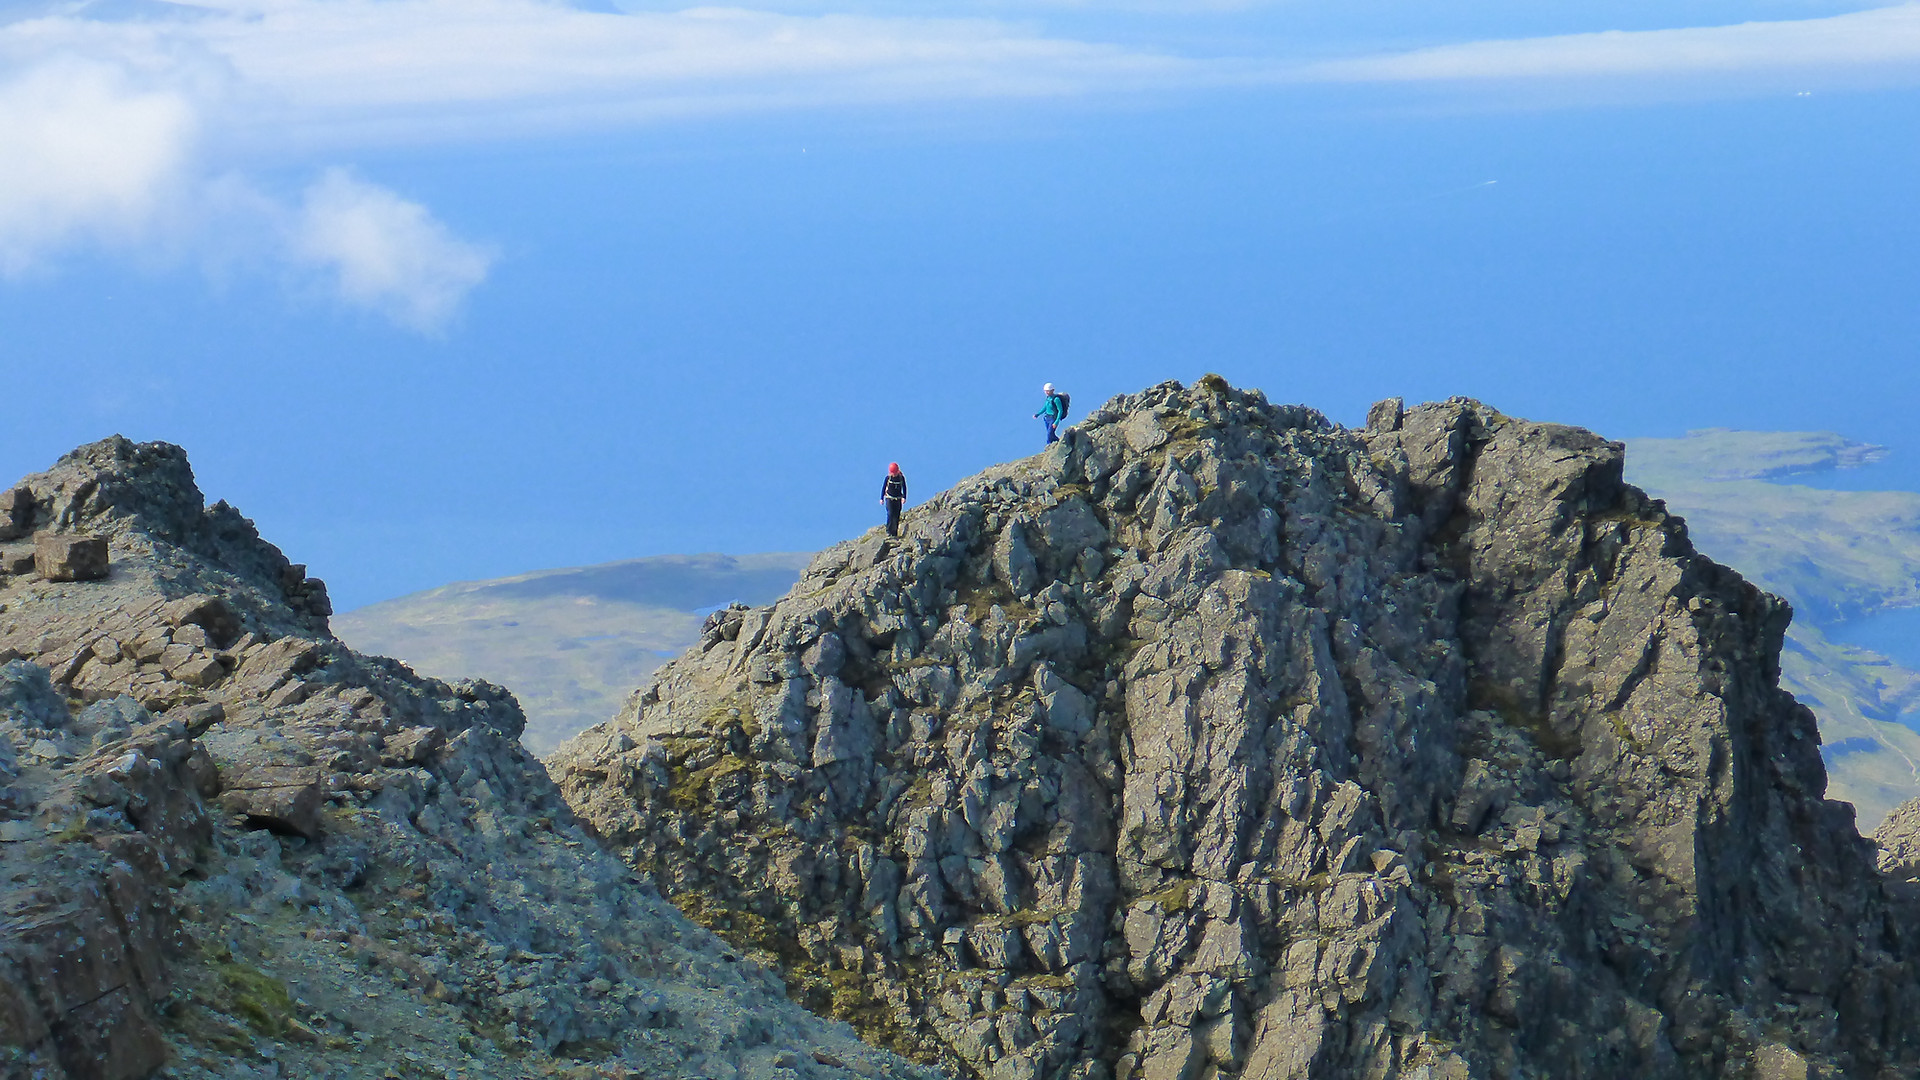 Guiding on the Skye Ridge